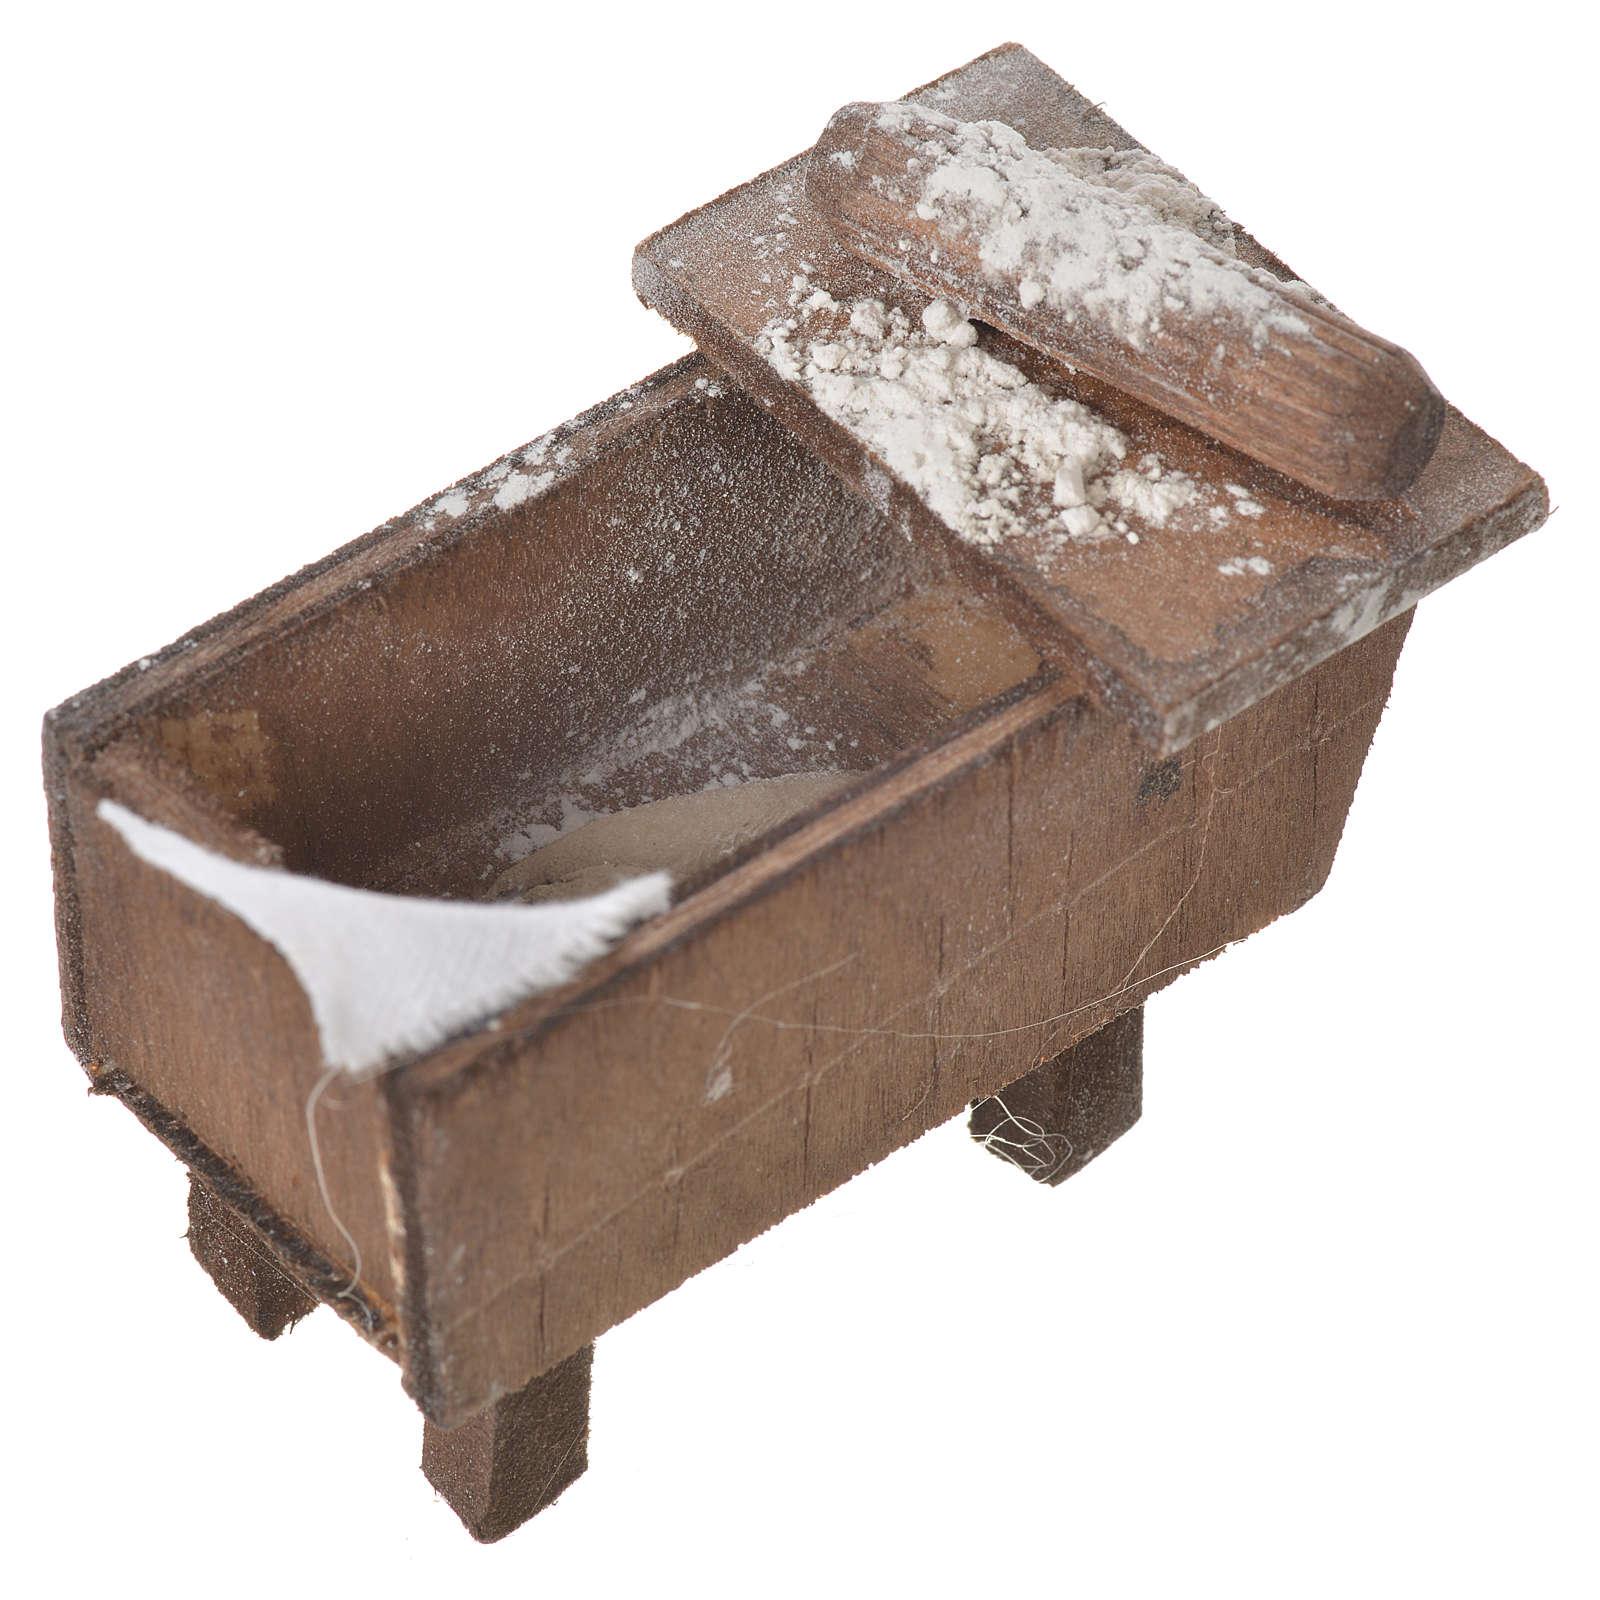 Nativity bread storage chest in terracotta 5x7.5x4cm 4